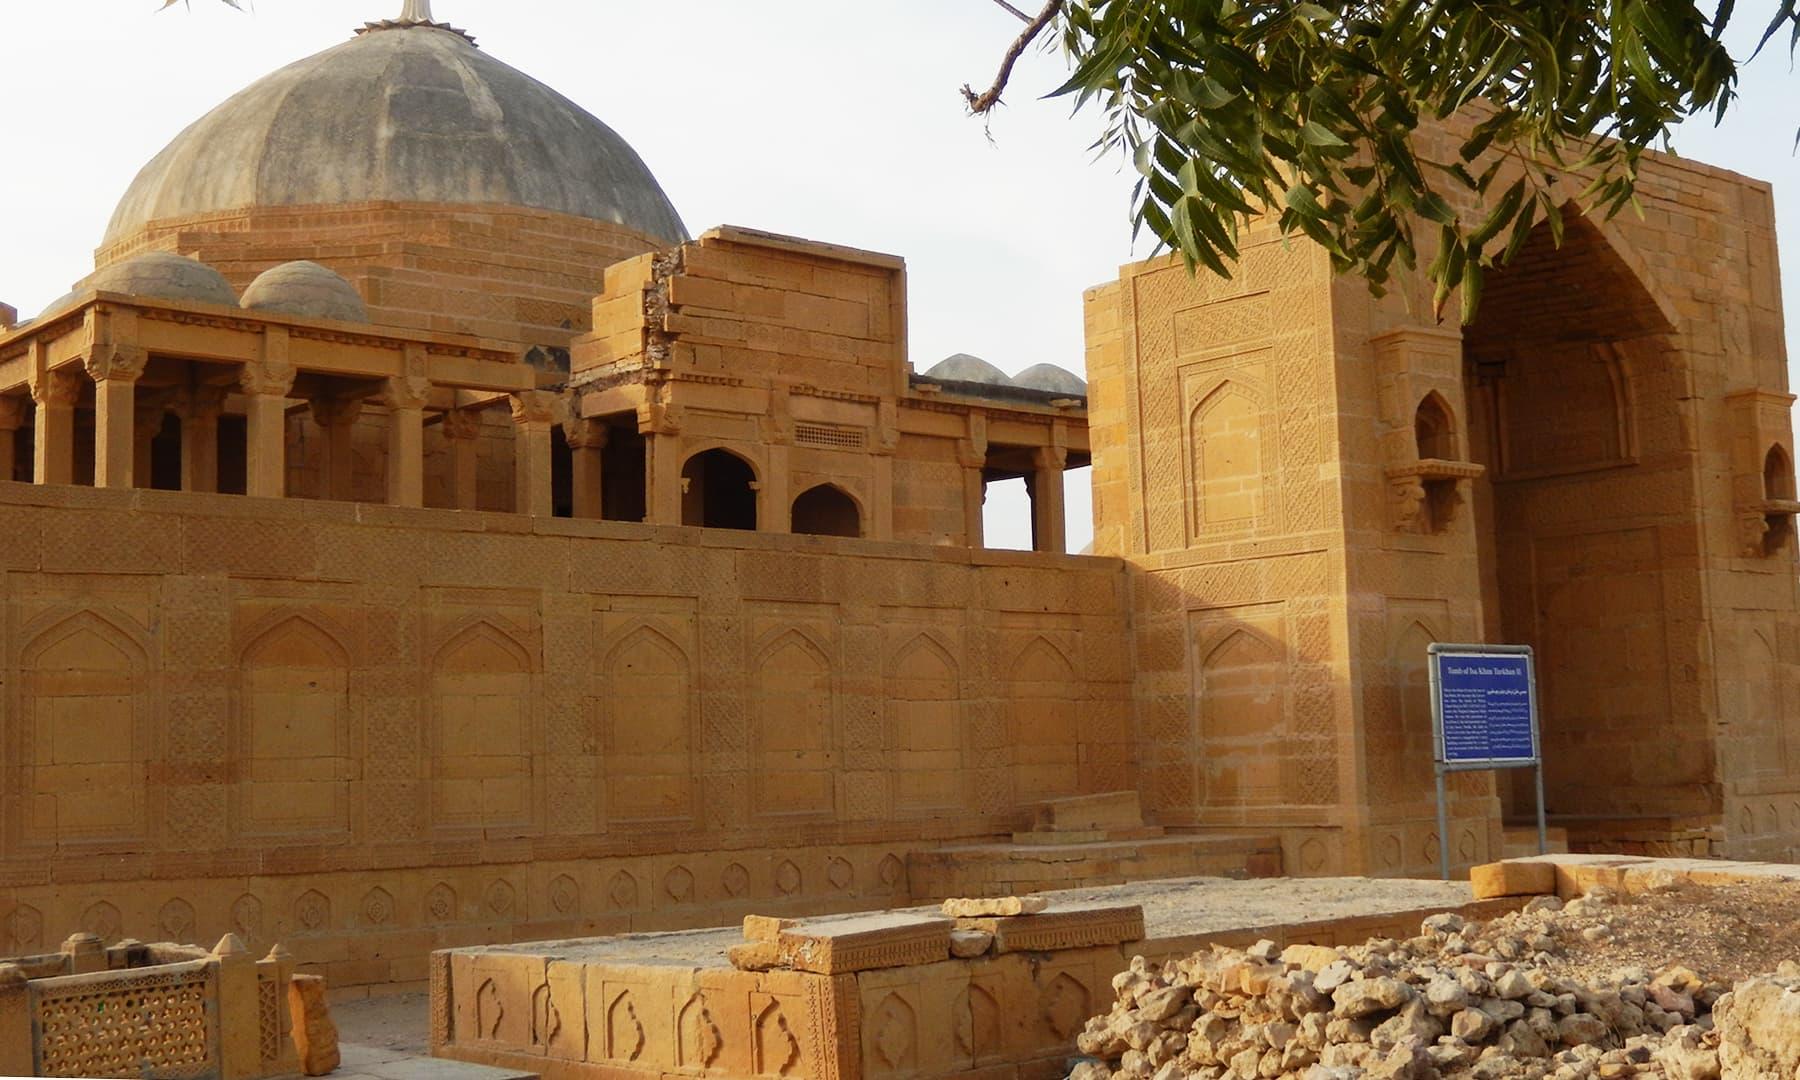 مقبرہ مرزا عیسیٰ خان ثانی —تصویر ابوبکر شیخ